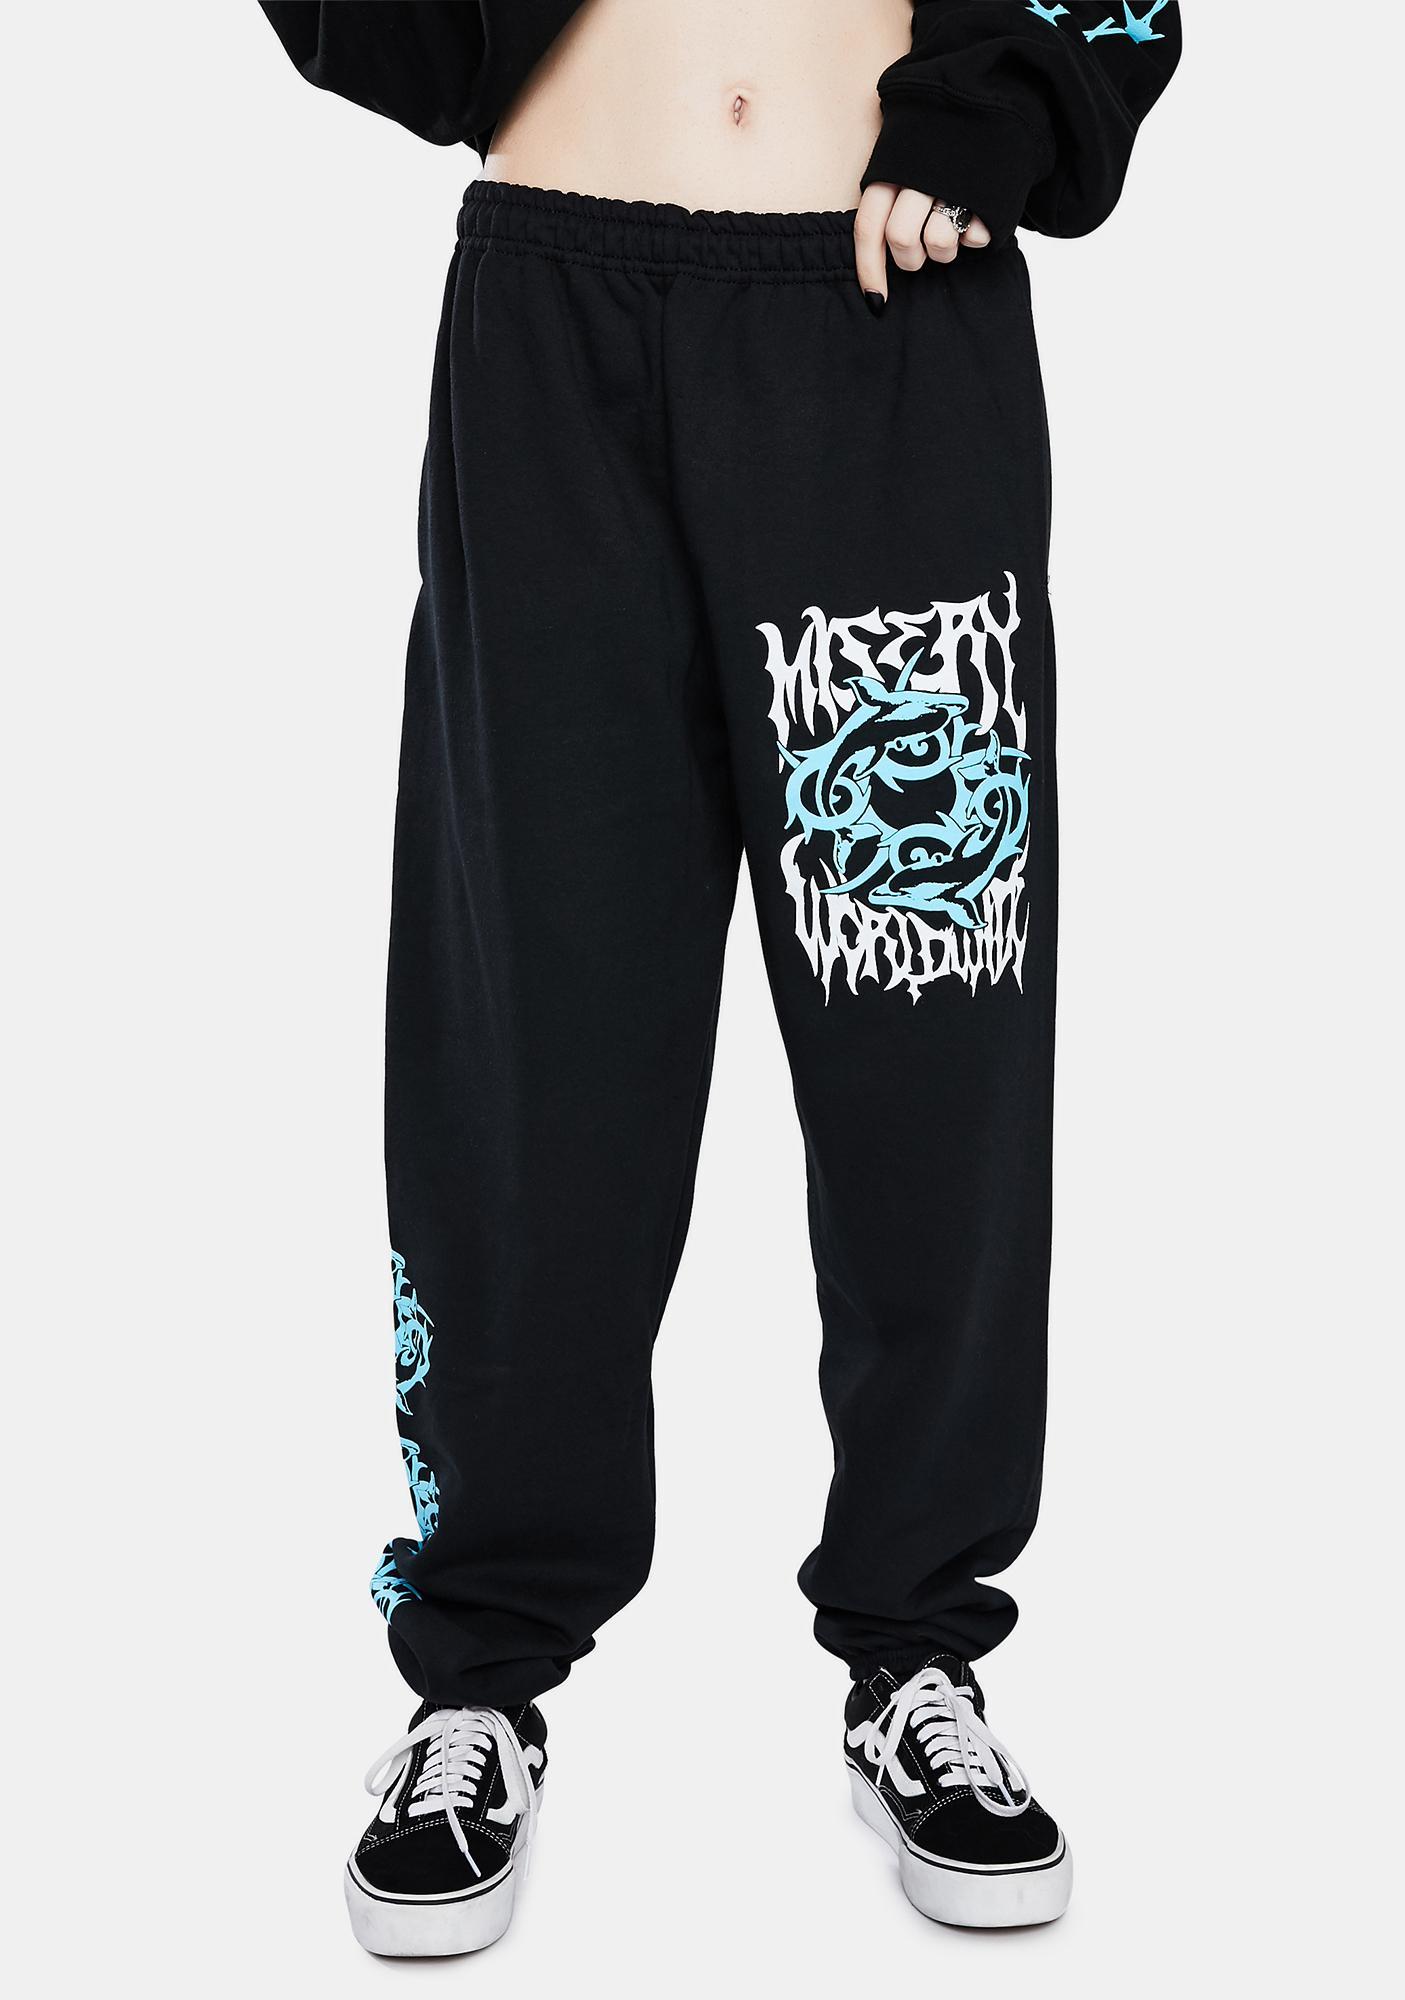 Misery Worldwide Black Los Delphines Sweatpants